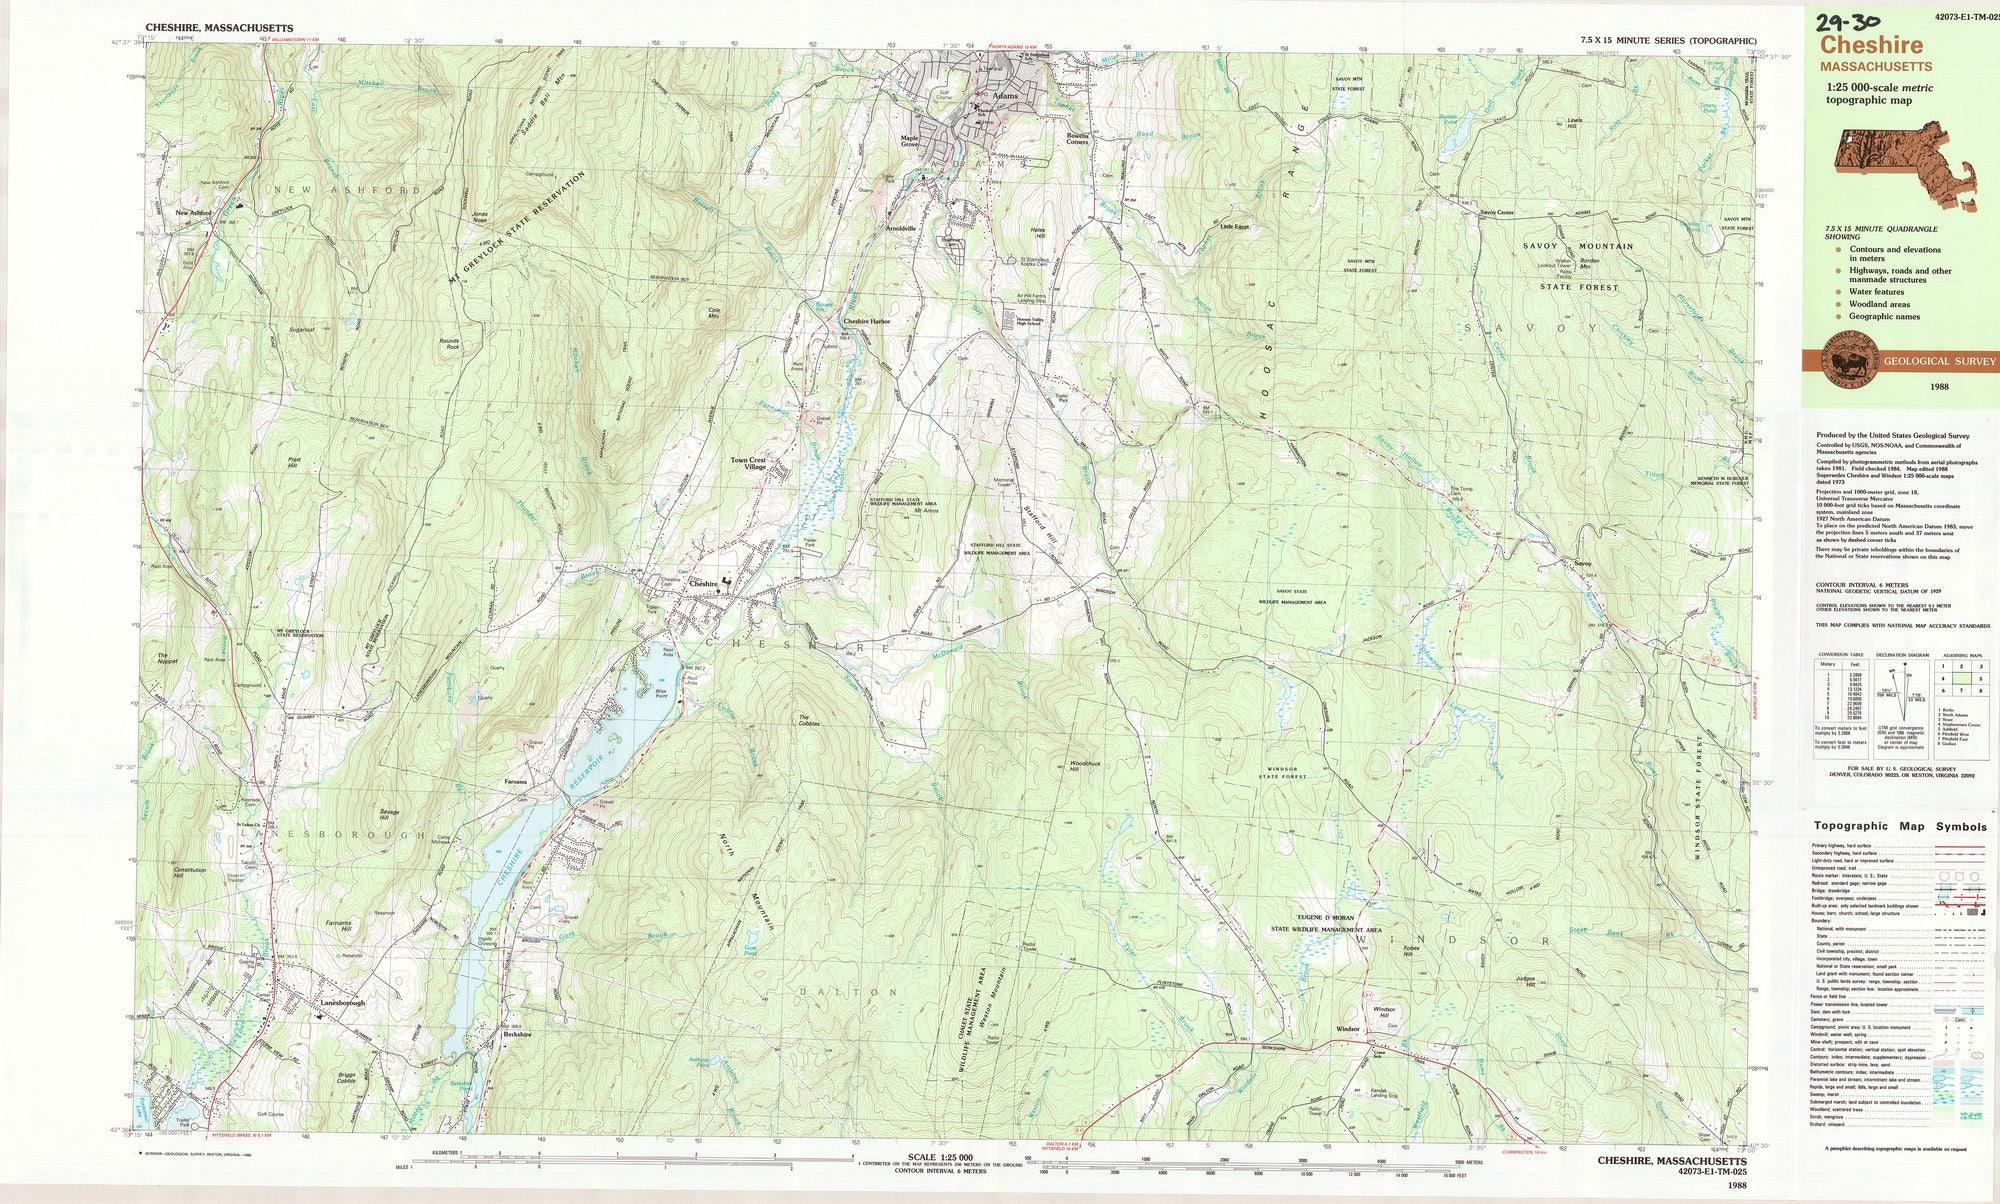 Cheshire 1988 Topo Map Original 1 25000 Folded 29 30 207 Etsy